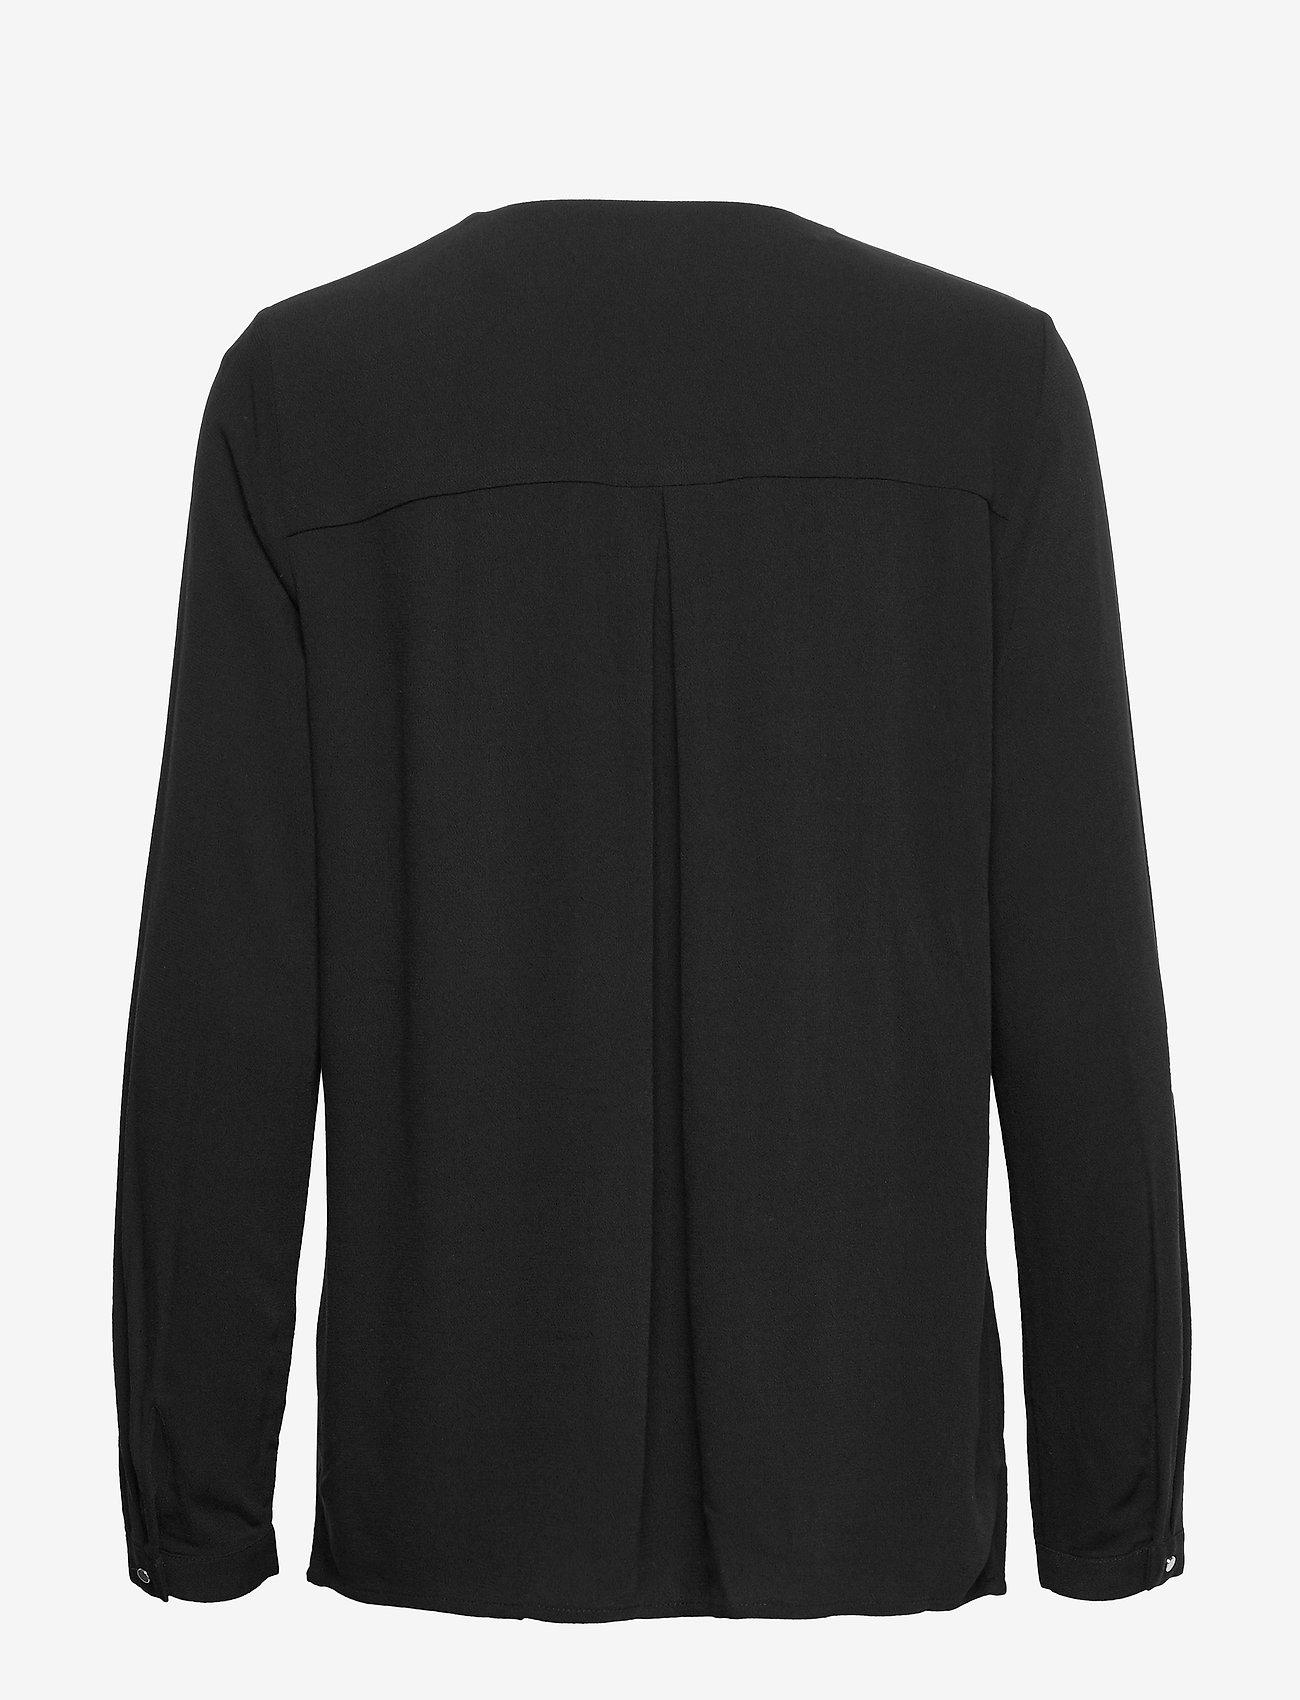 Esprit Collection Blouses Woven - Blusar & Skjortor Black